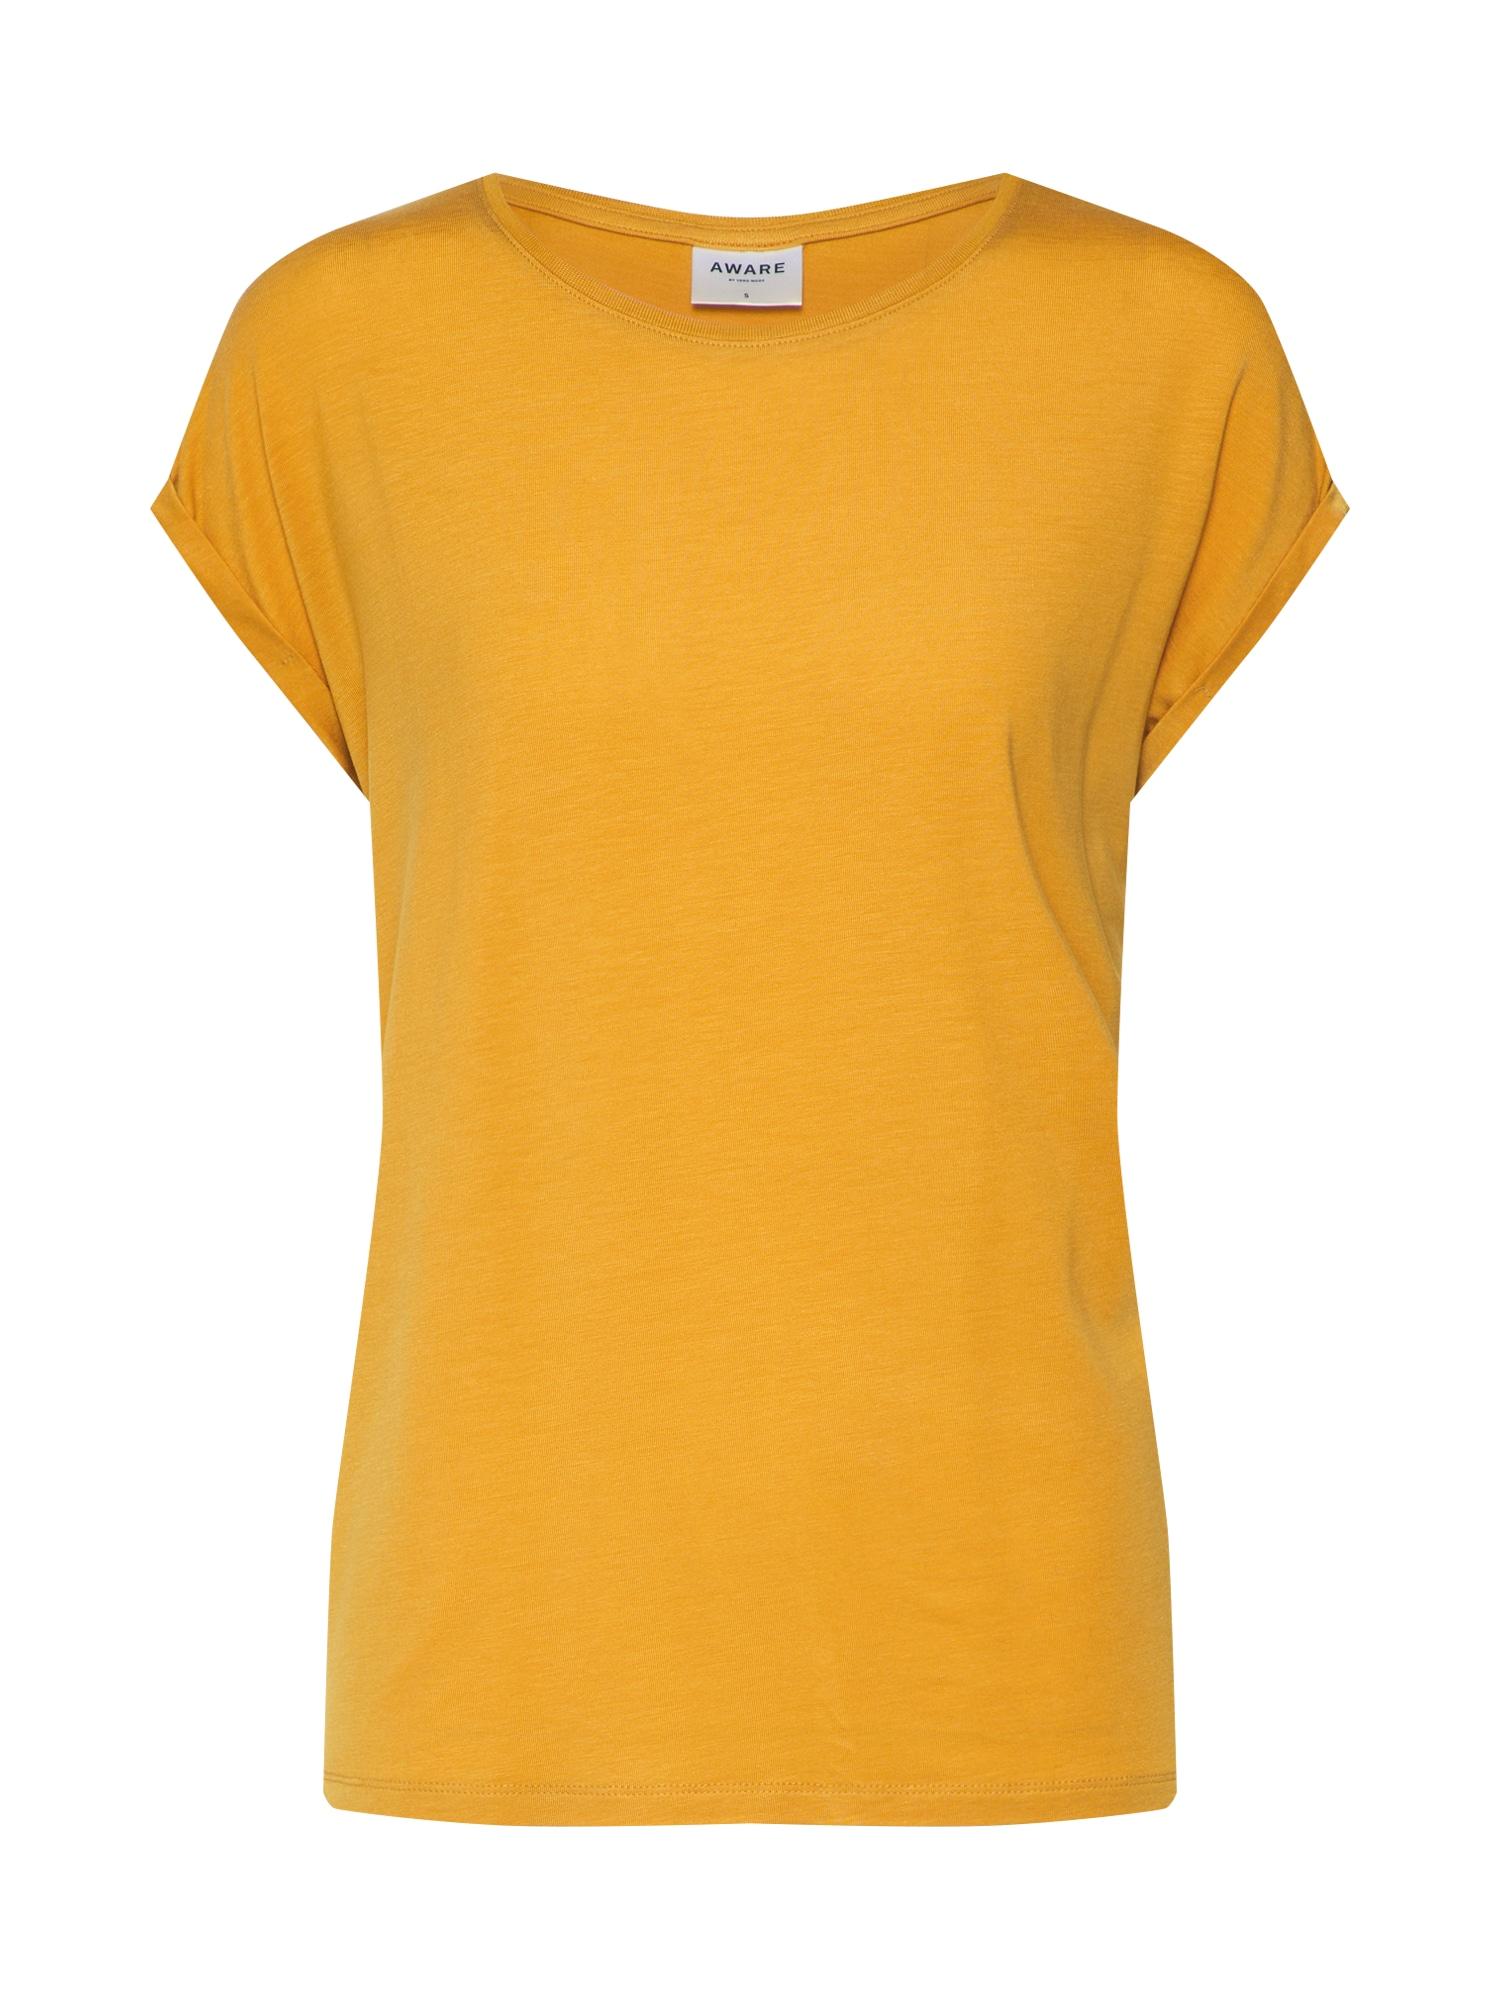 Oversized tričko AVA PLAIN zlatě žlutá VERO MODA